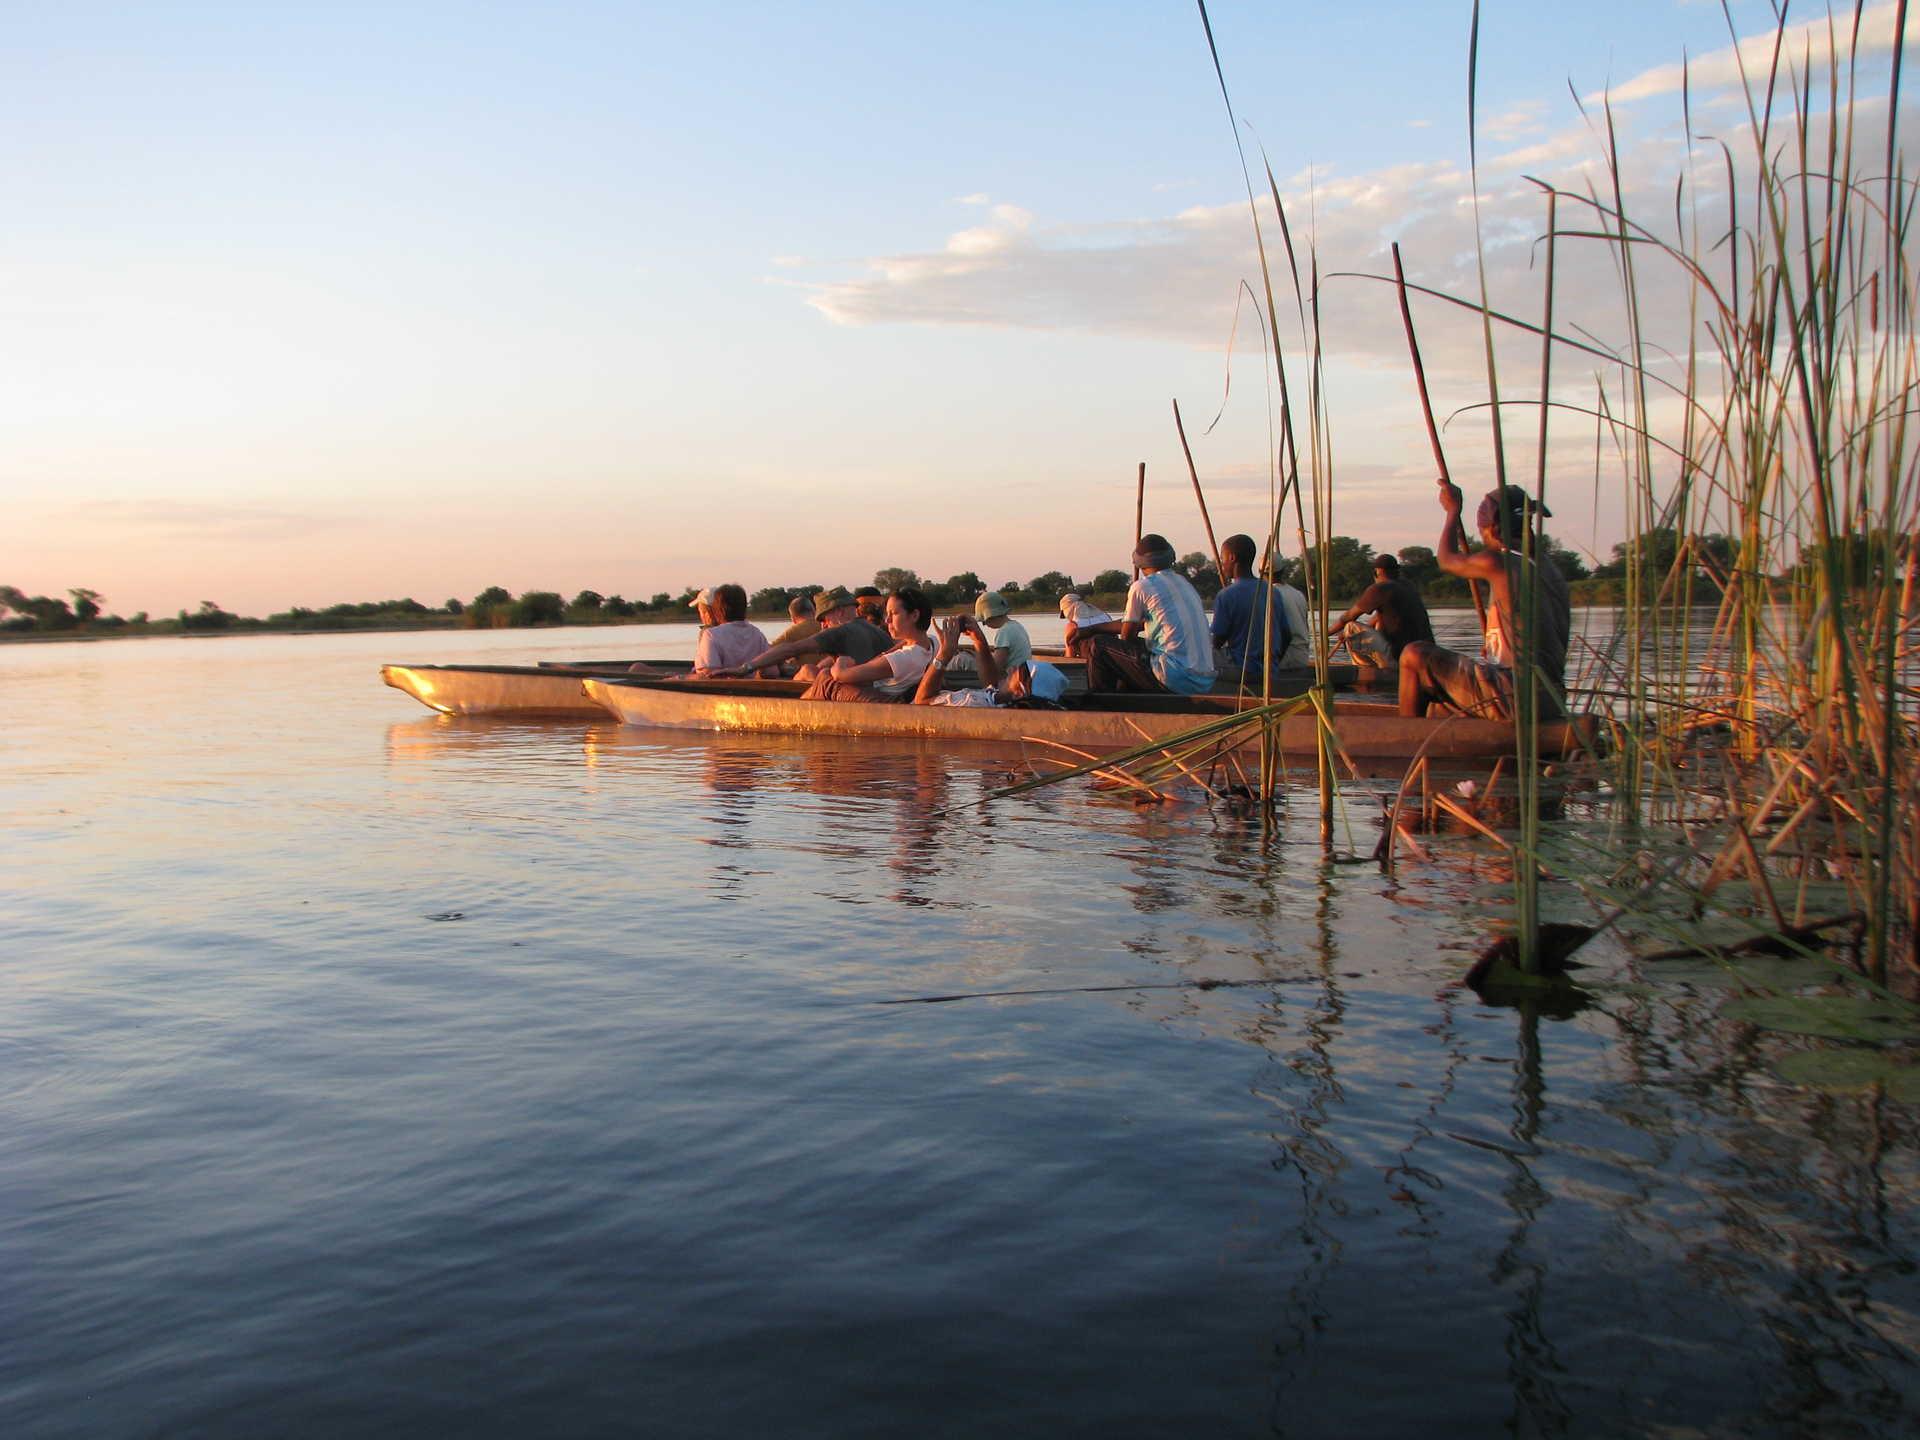 Balade en pirogue traditionnelle au Botswana